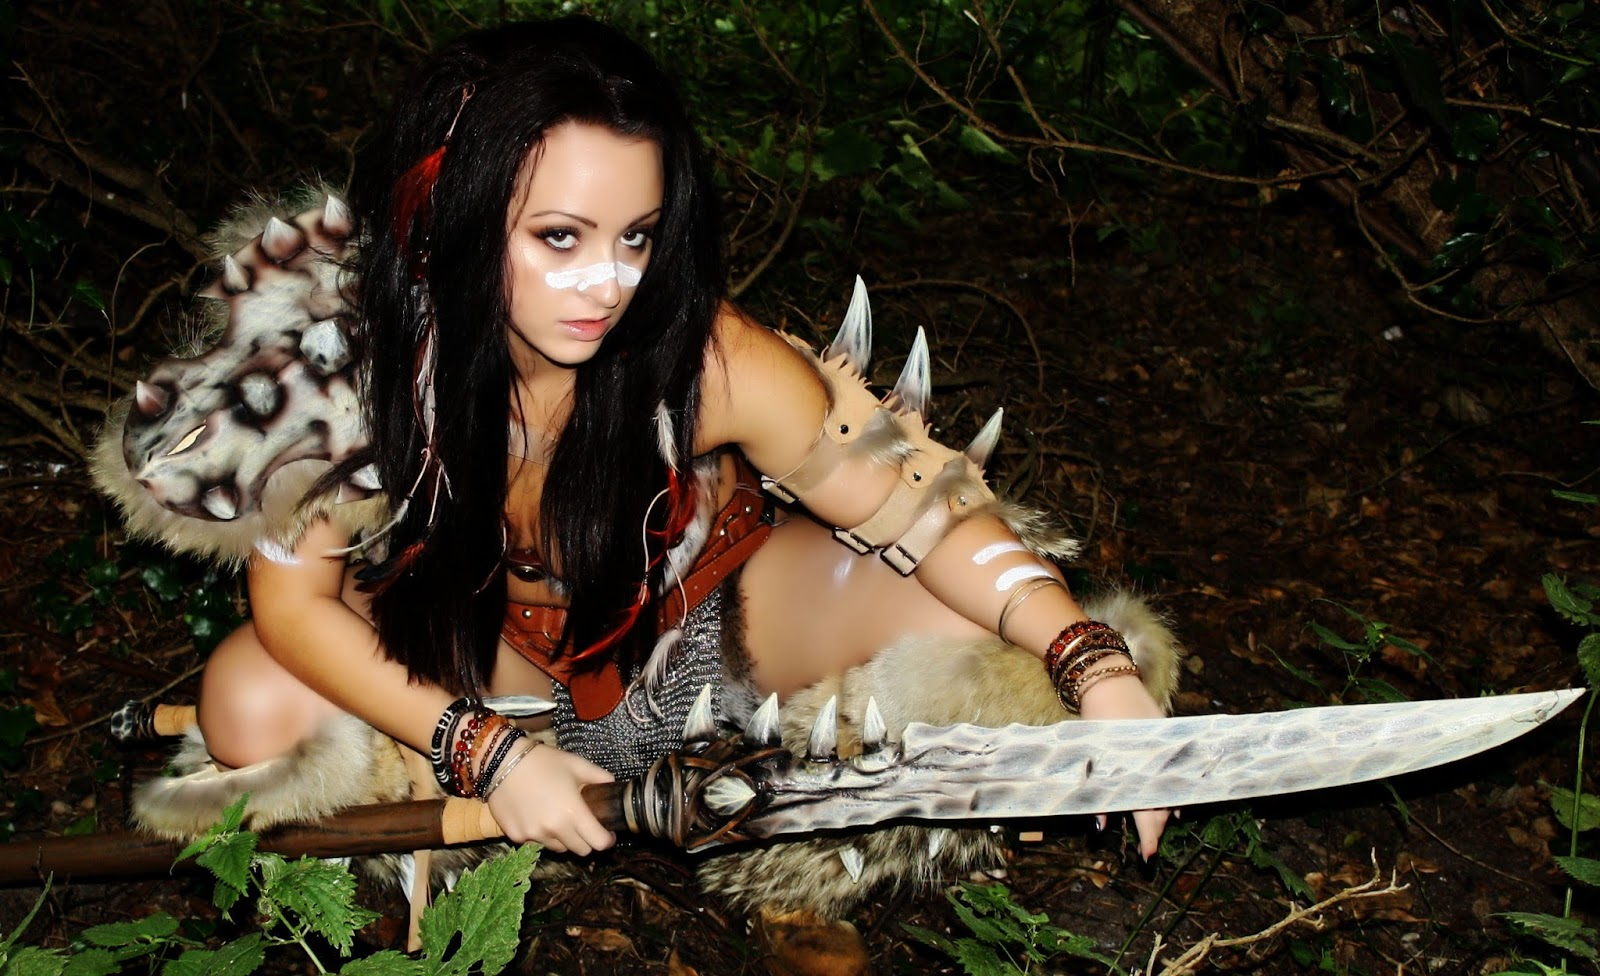 Nude and sexy barbarian girls pic hentai photo